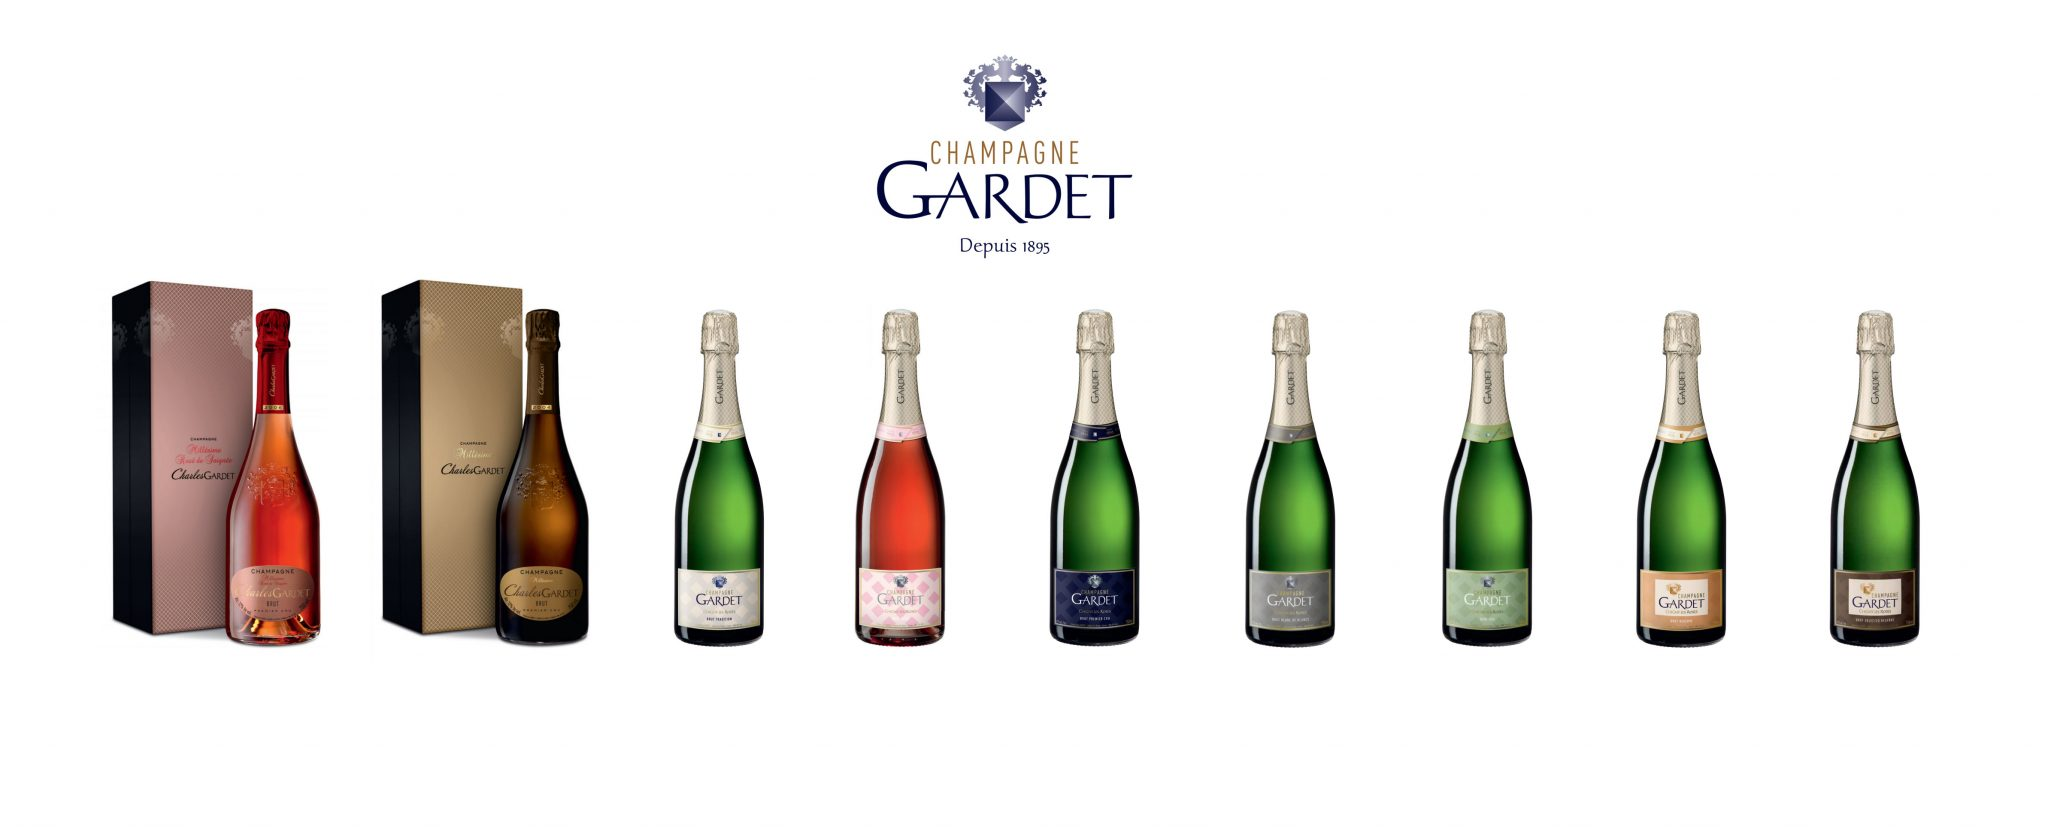 Champagne Charles Gardet